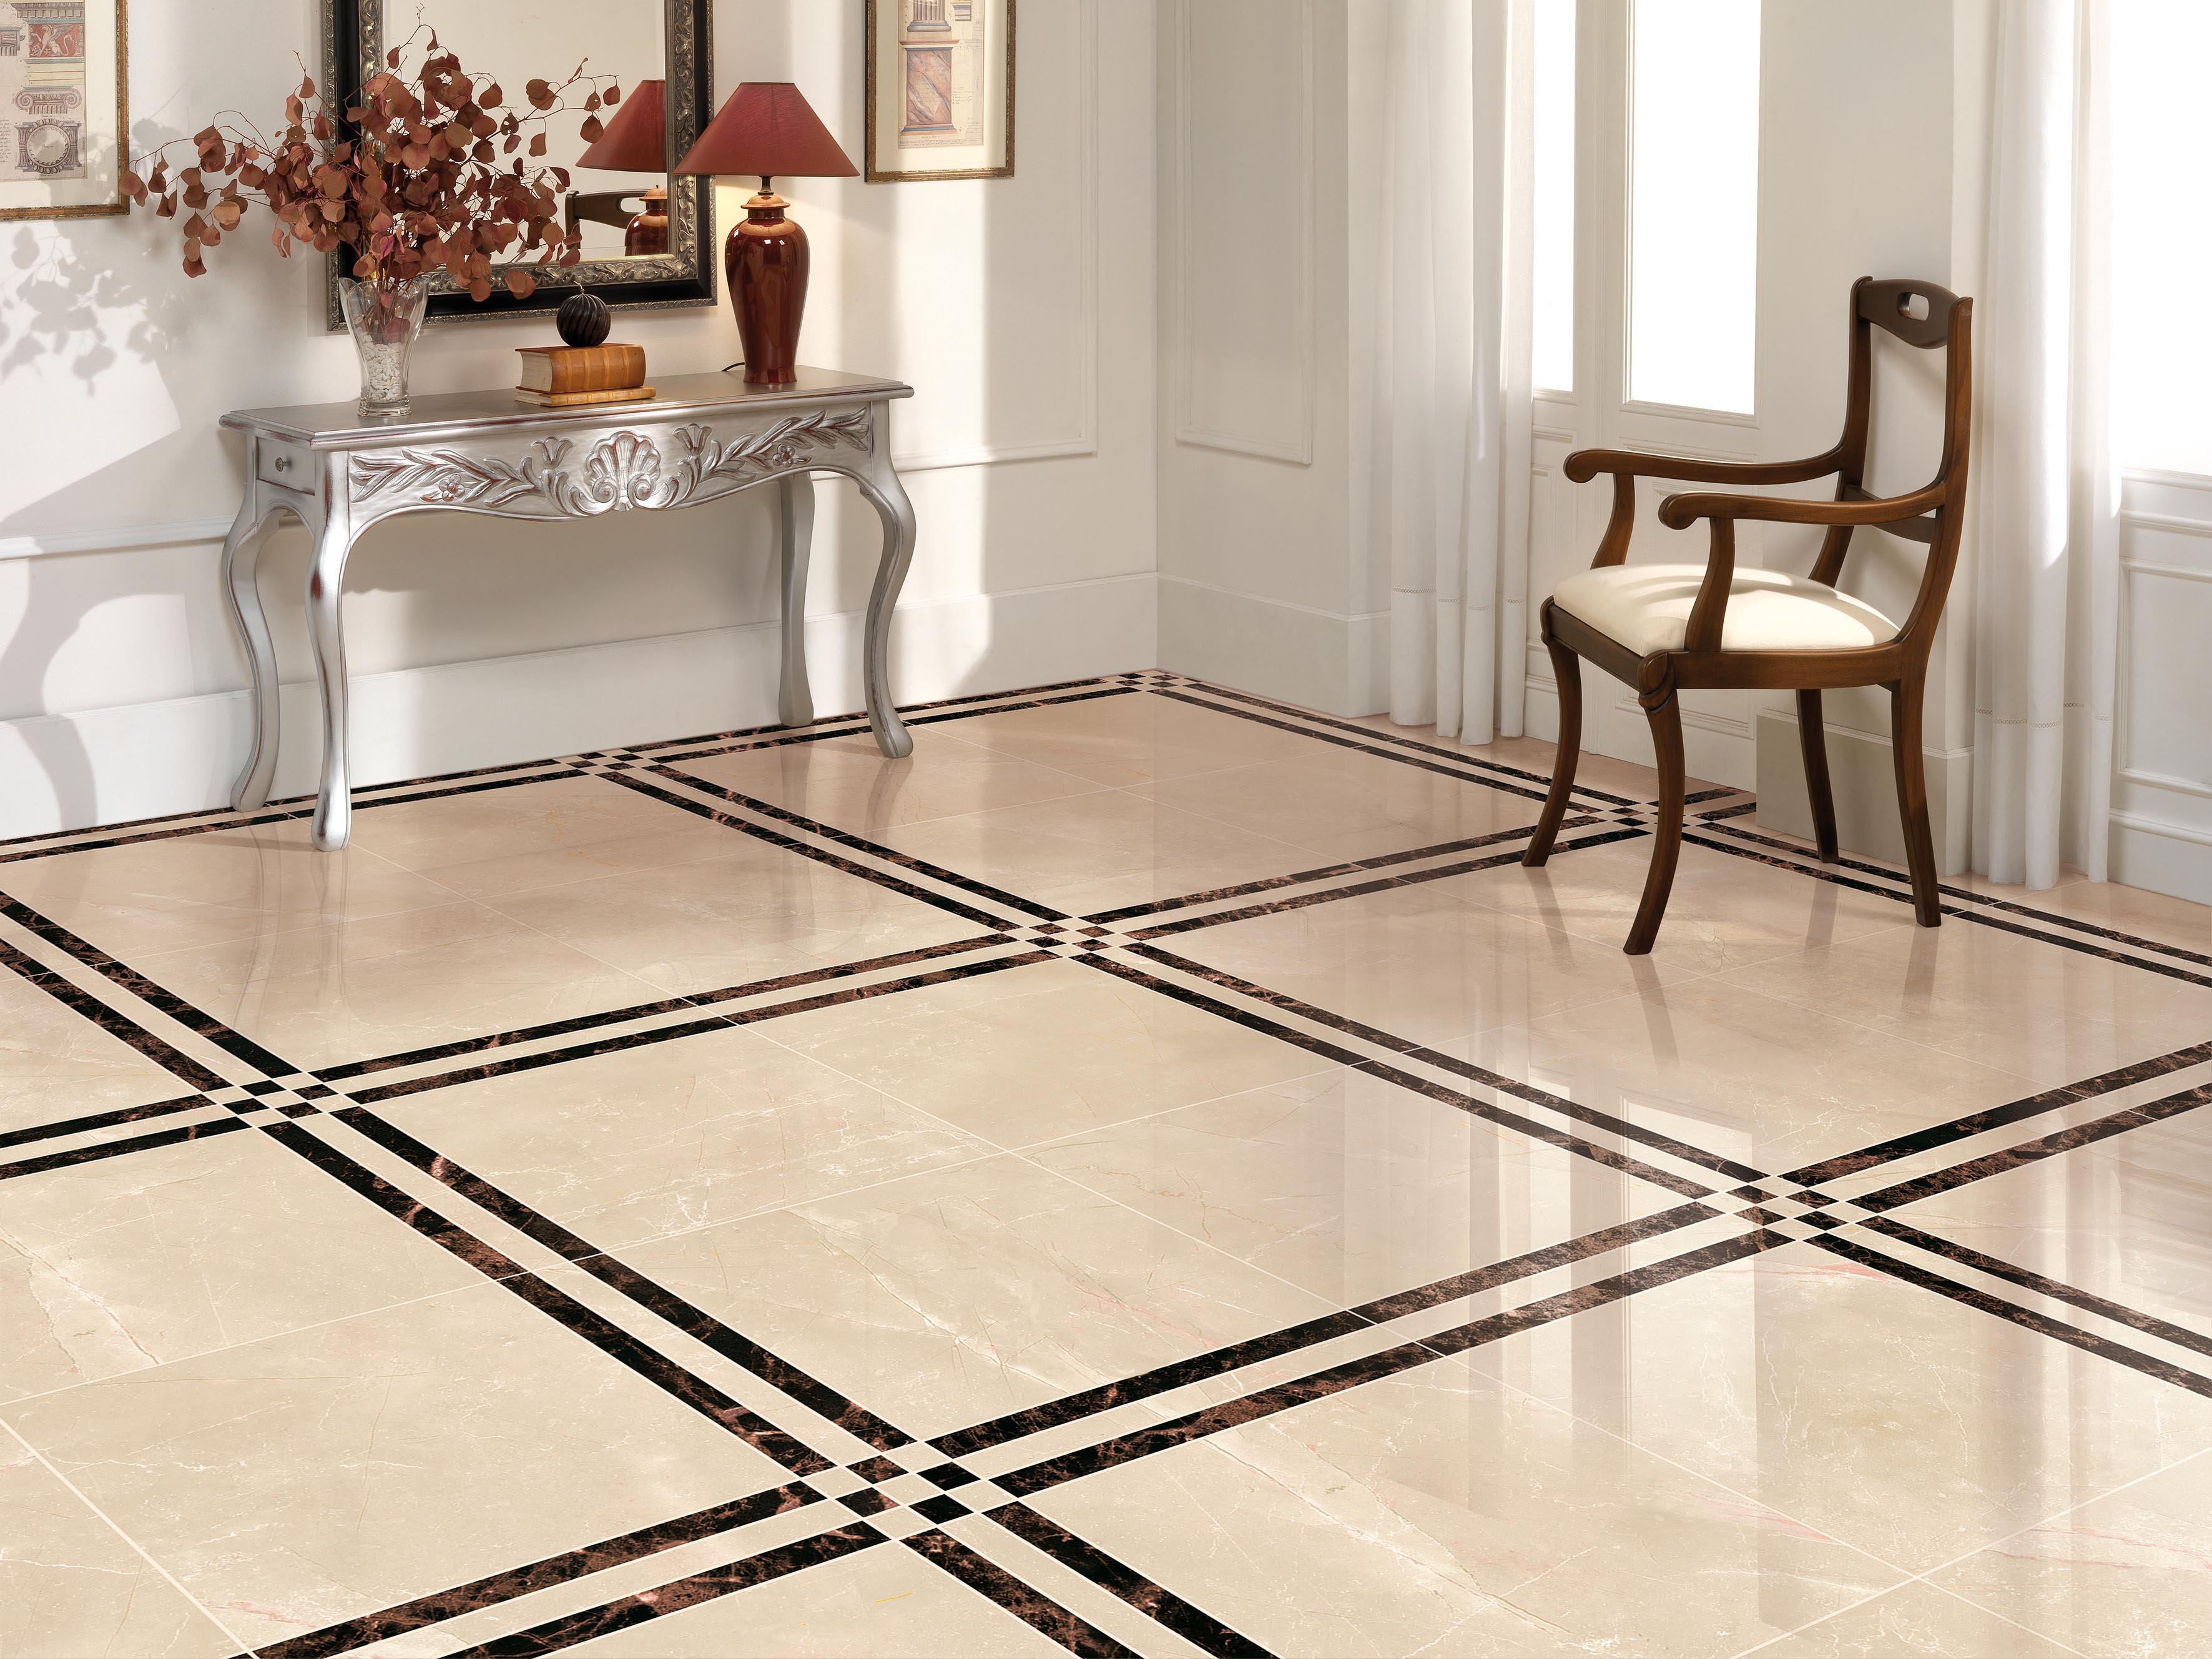 for Modelos de pisos ceramicos para cocina